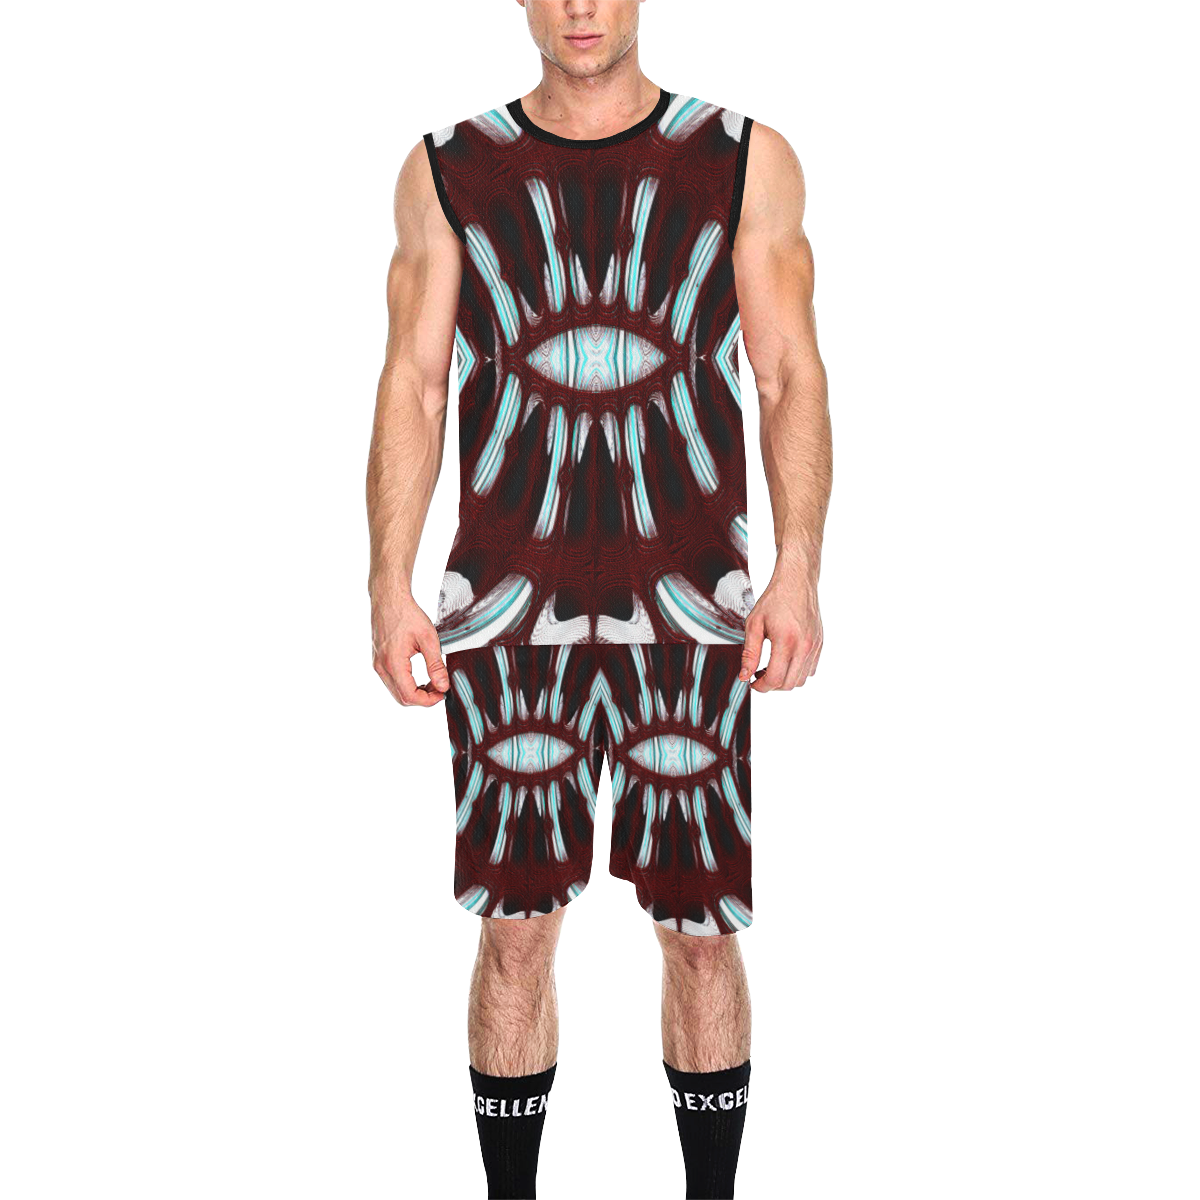 8000  EKPAH 6 low sml All Over Print Basketball Uniform